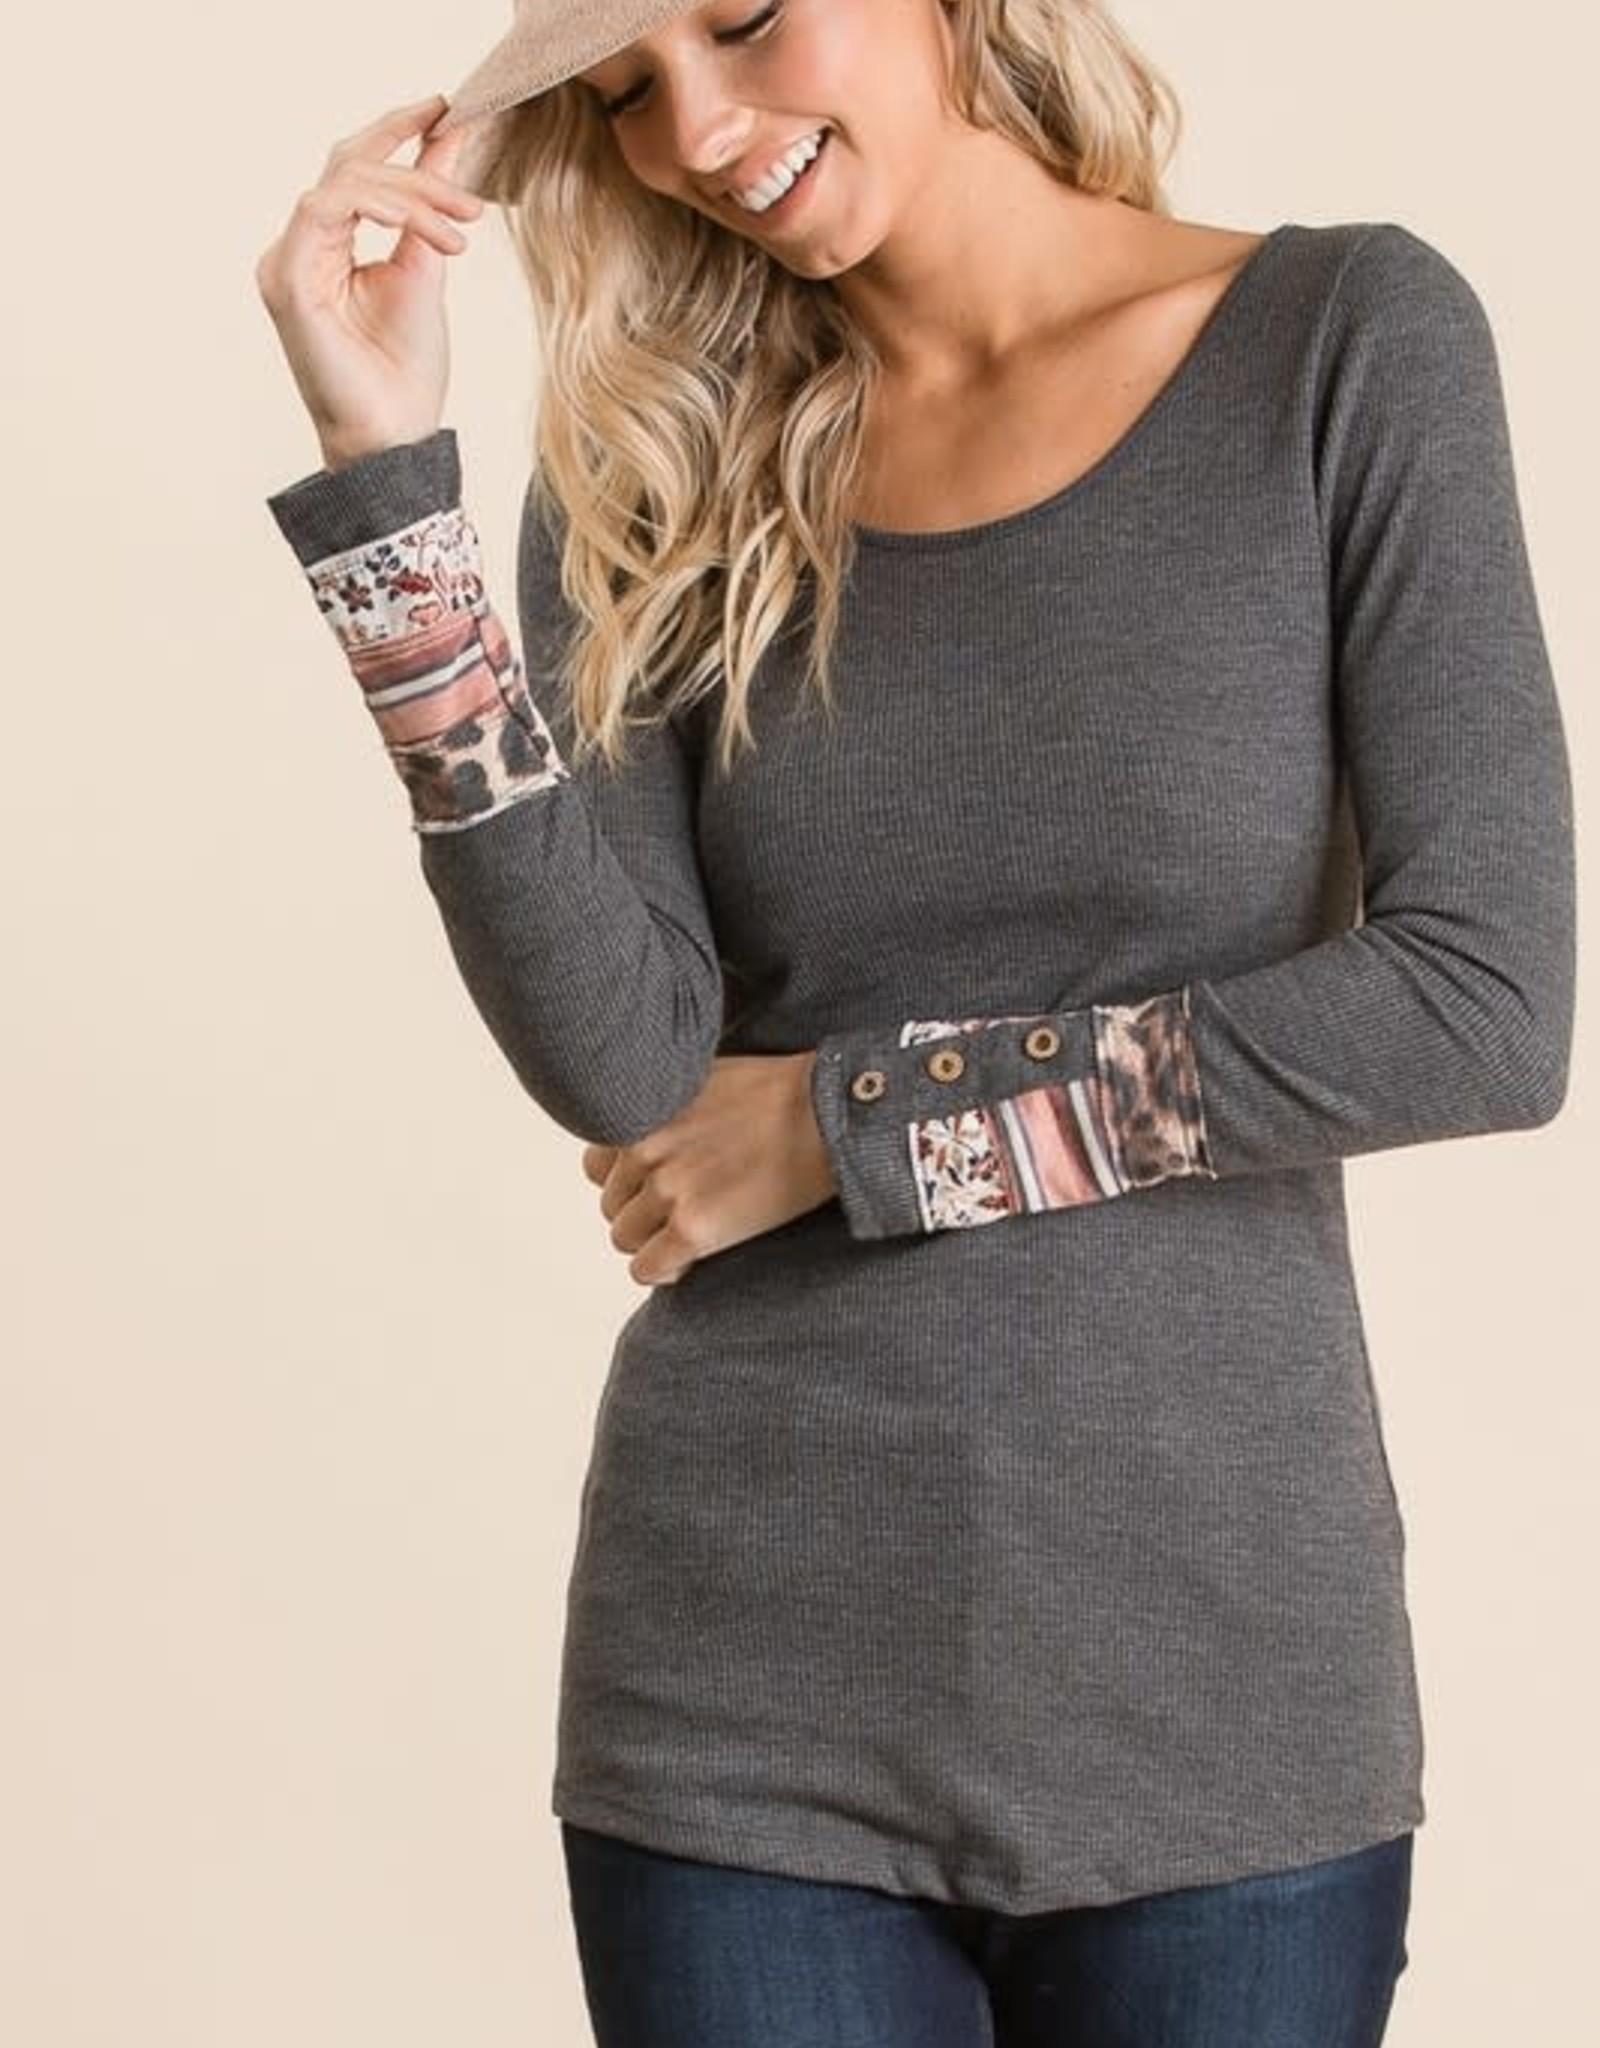 TLC 8023 long sleeve tshirt with cuff detail